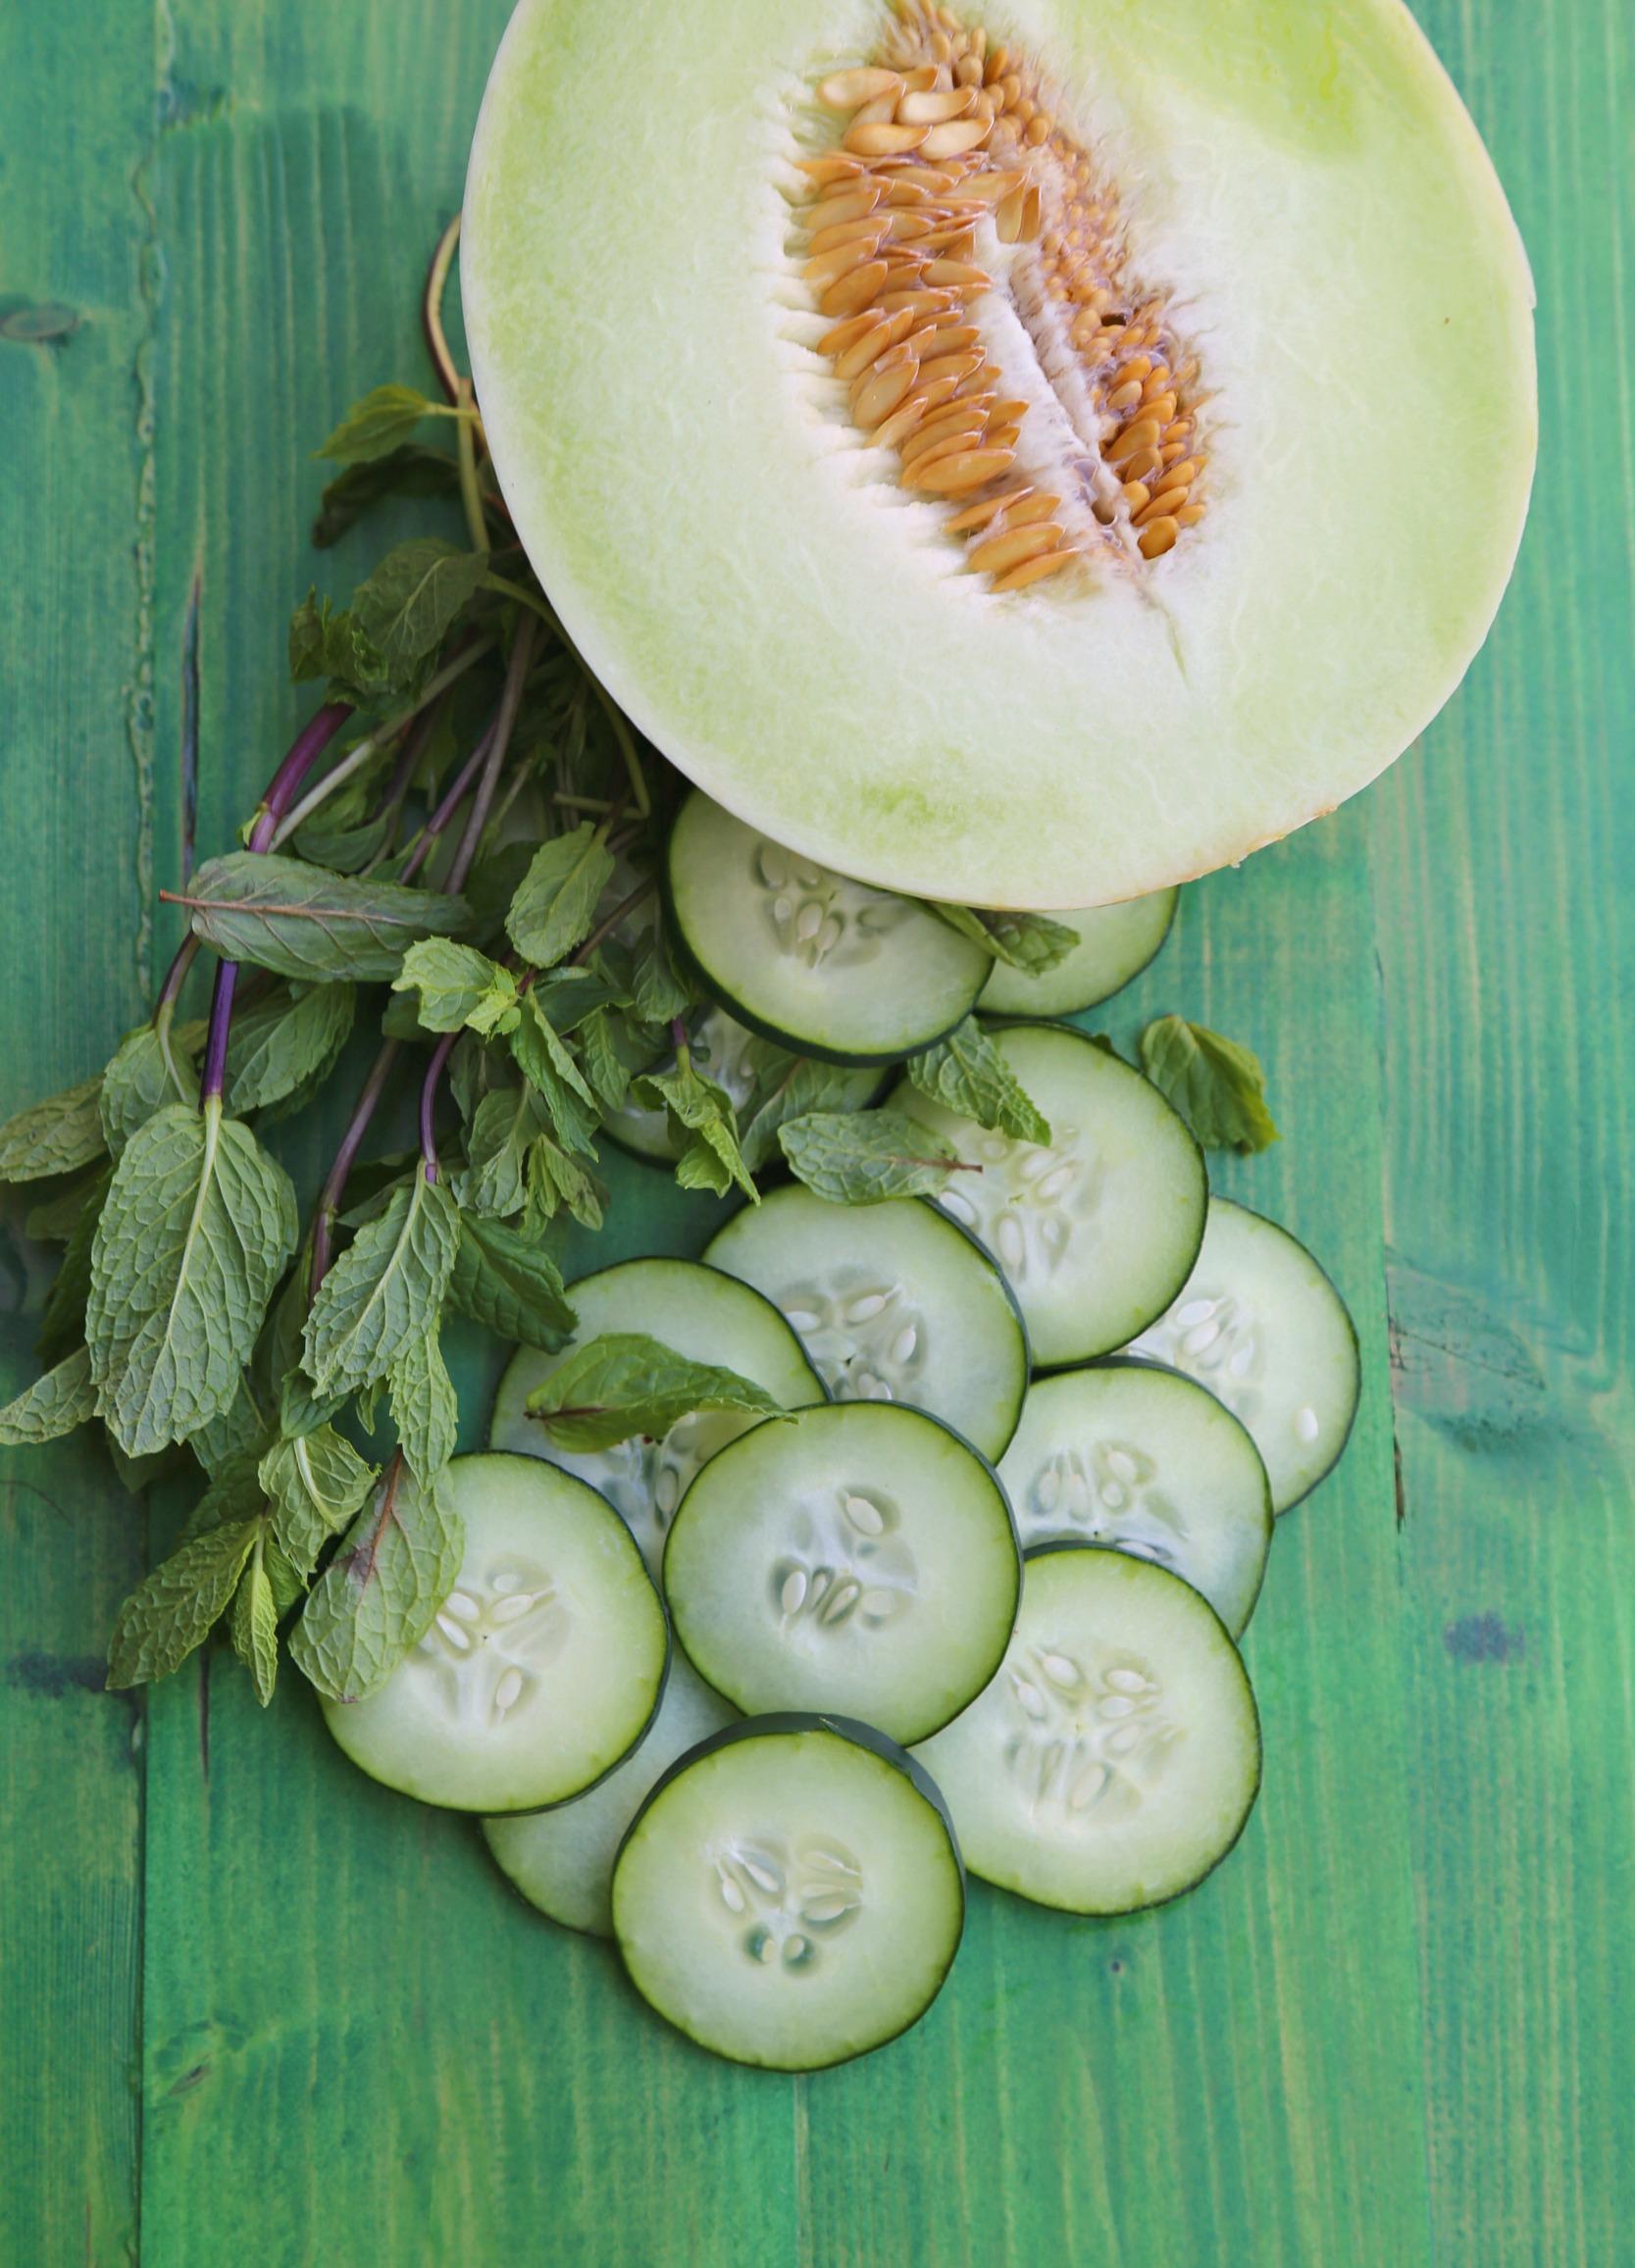 melon-cucumber-mint-for-agua-fresca-vianneyrodriguez-sweetlifebake